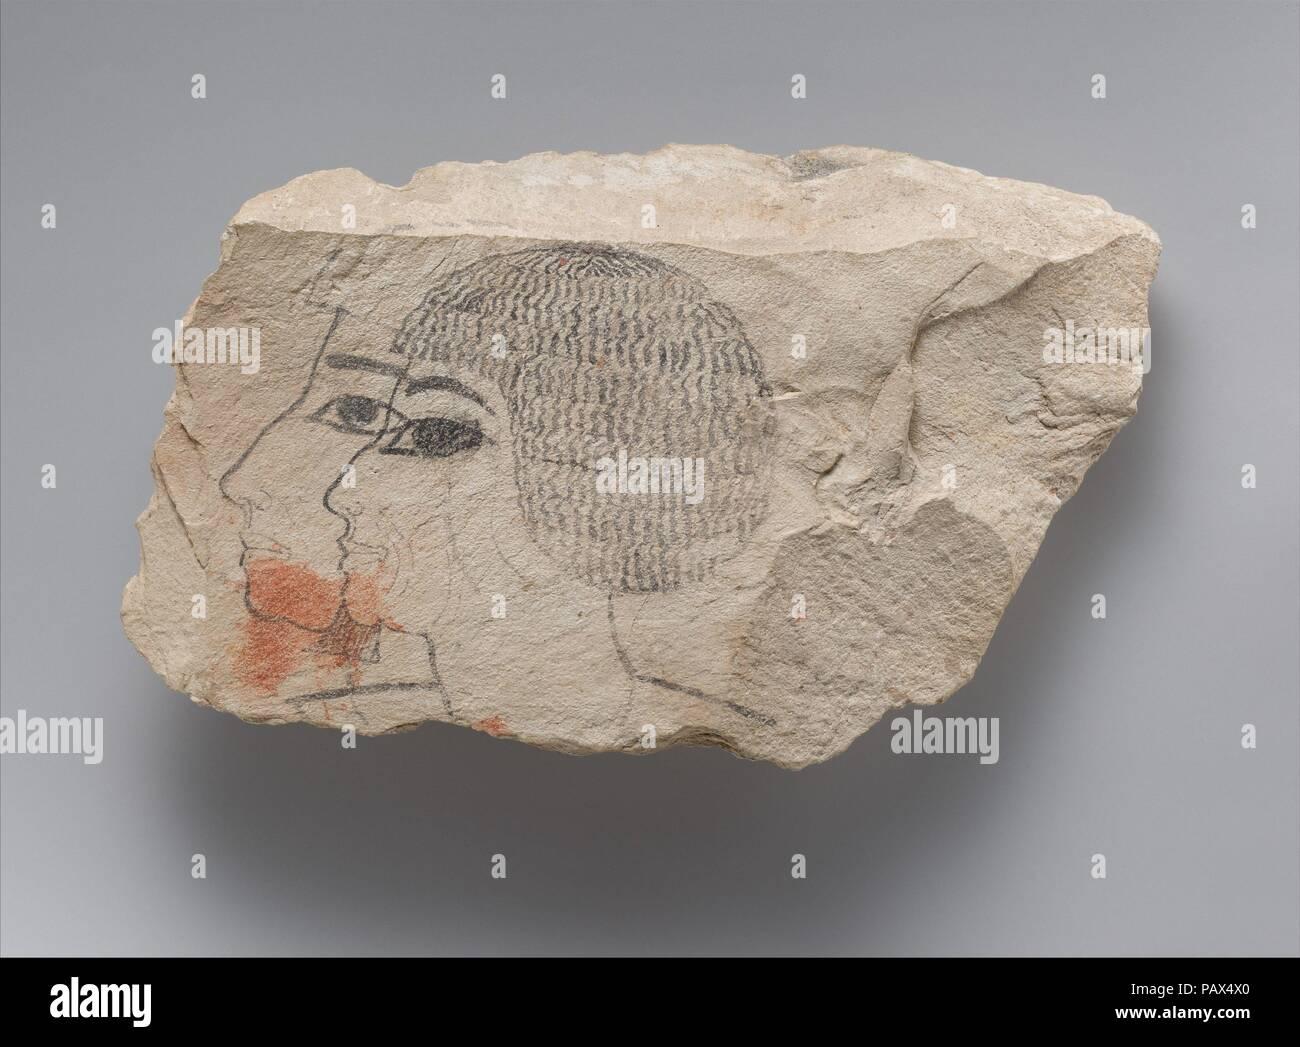 Egyptian Scribes Stockfotos & Egyptian Scribes Bilder - Alamy